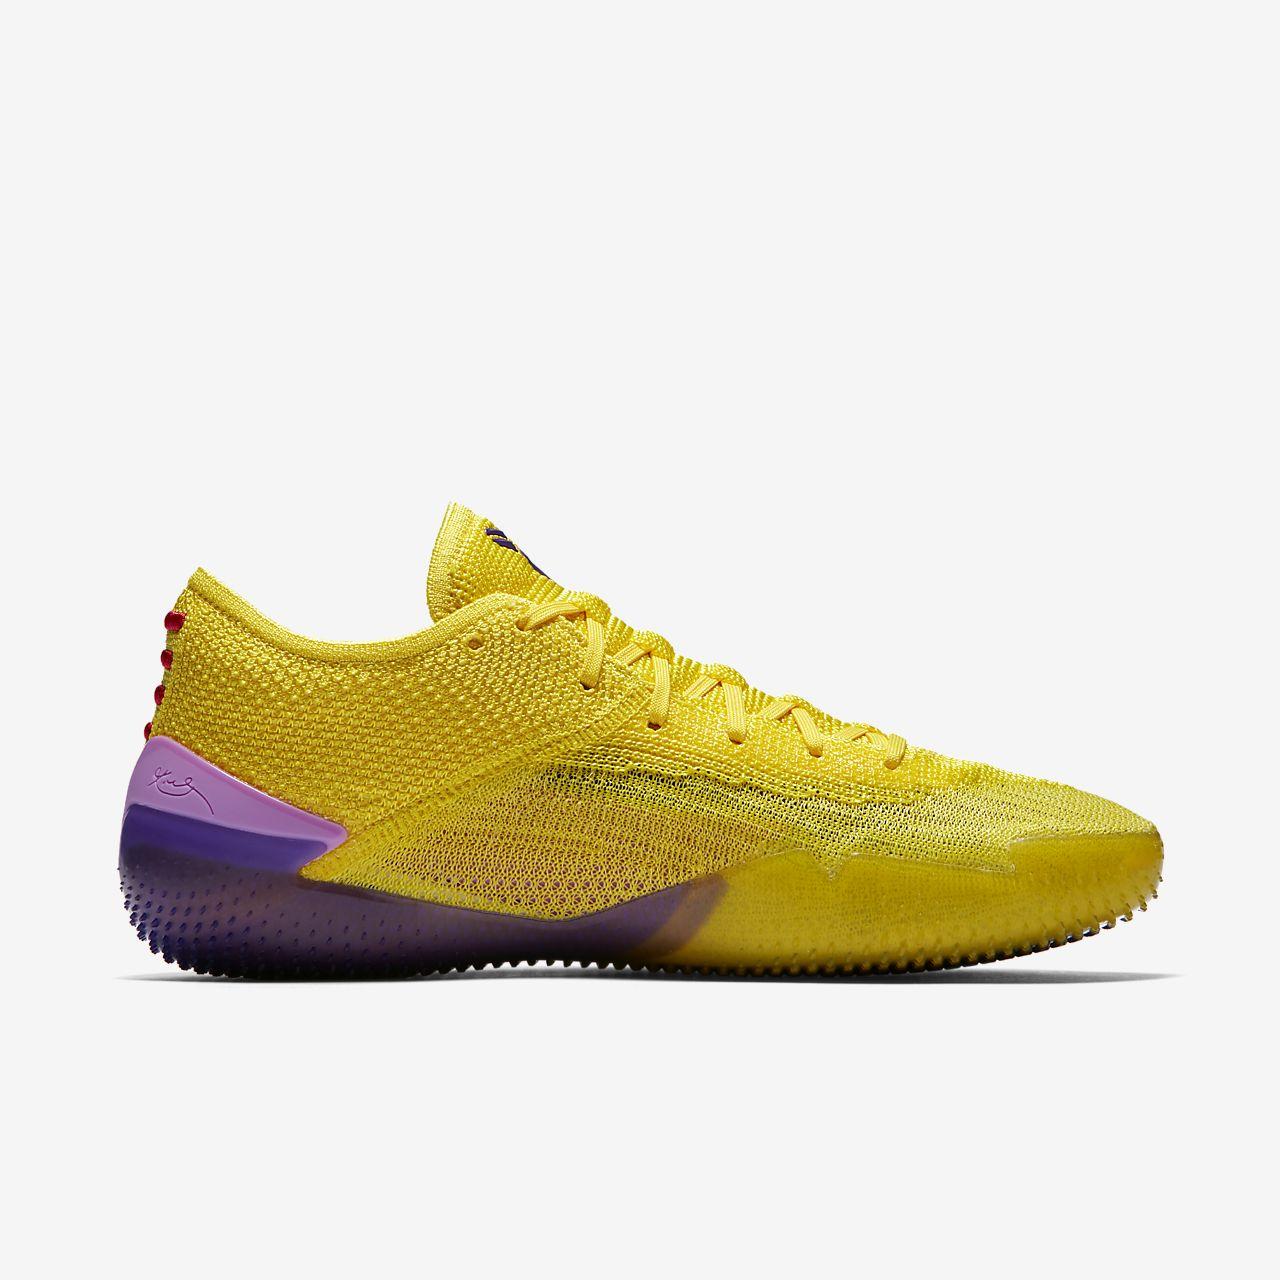 huge discount 2f6bc dba68 ... Kobe A.D. NXT 360 Basketball Shoe